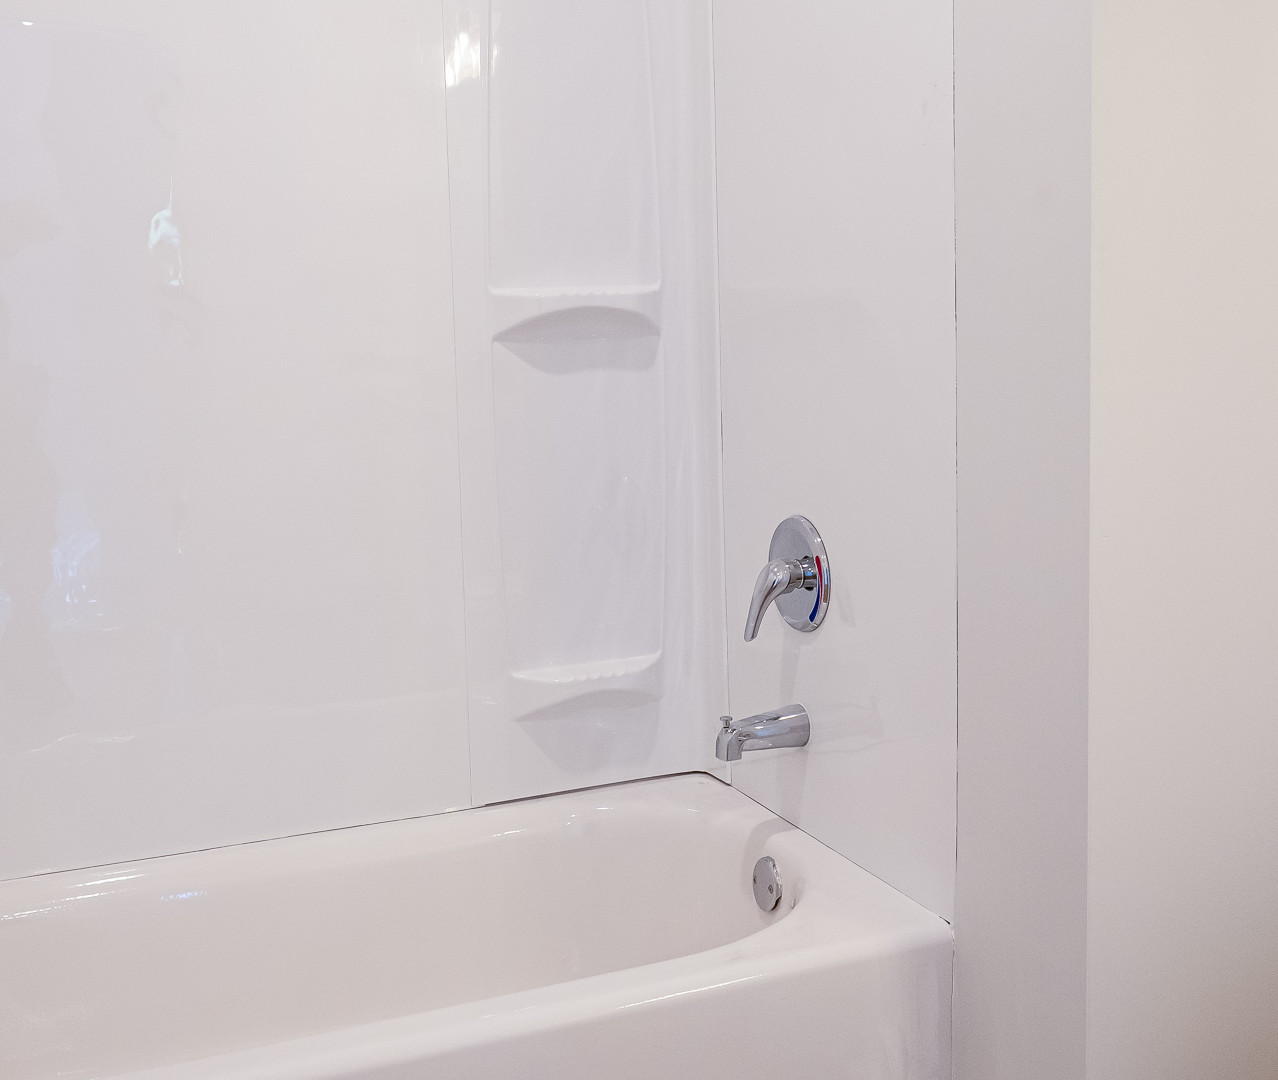 Upstairs Guest Bathroom Shower-Tub